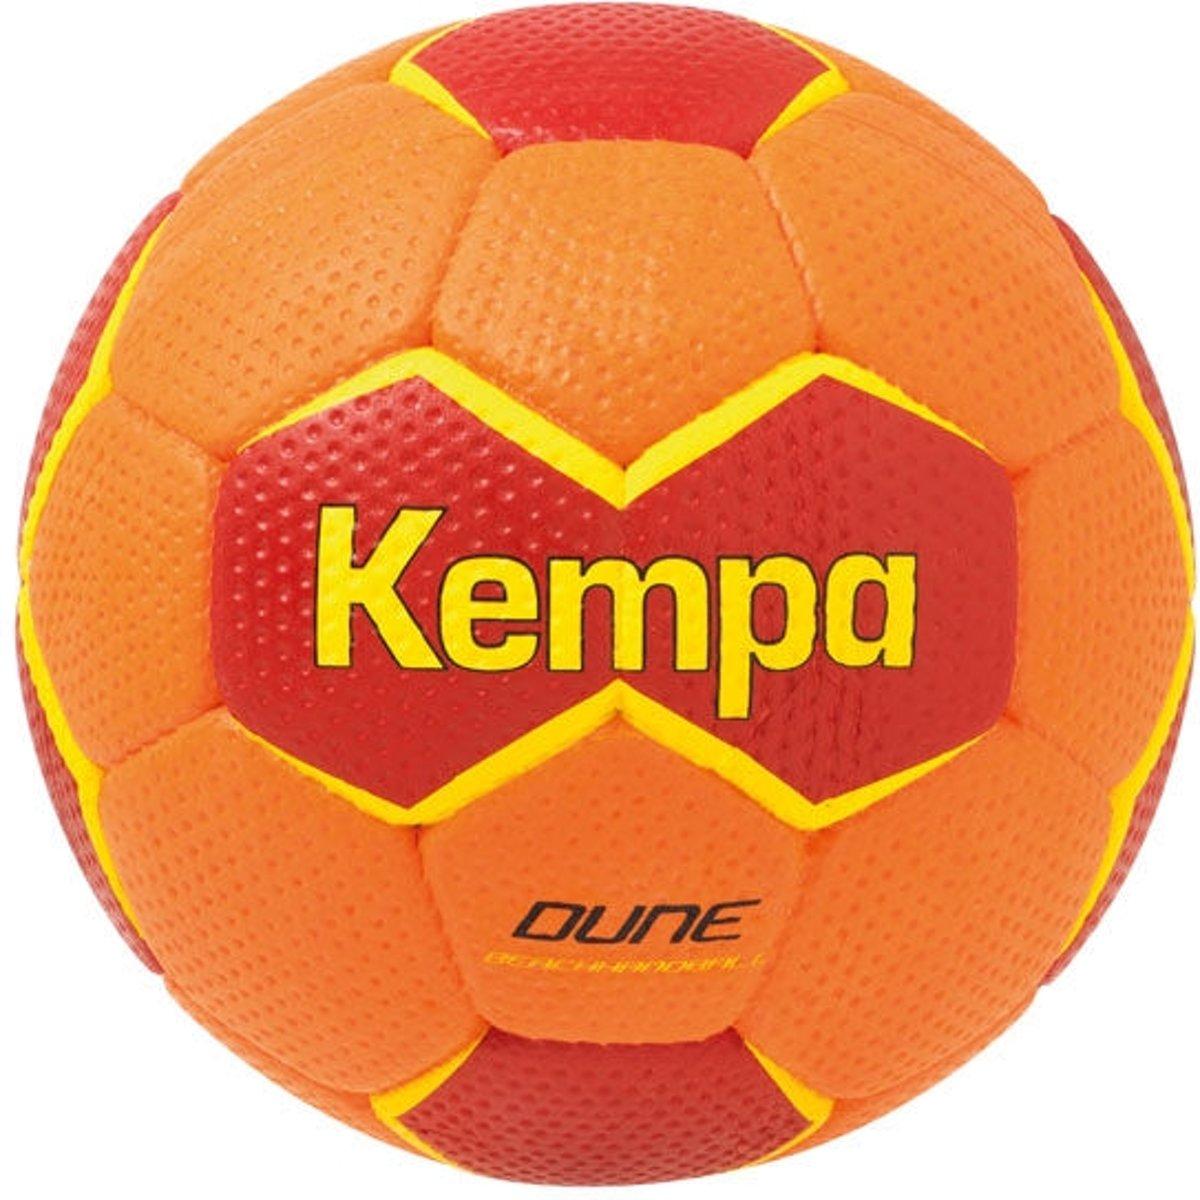 Kempa Handbal Dune kopen